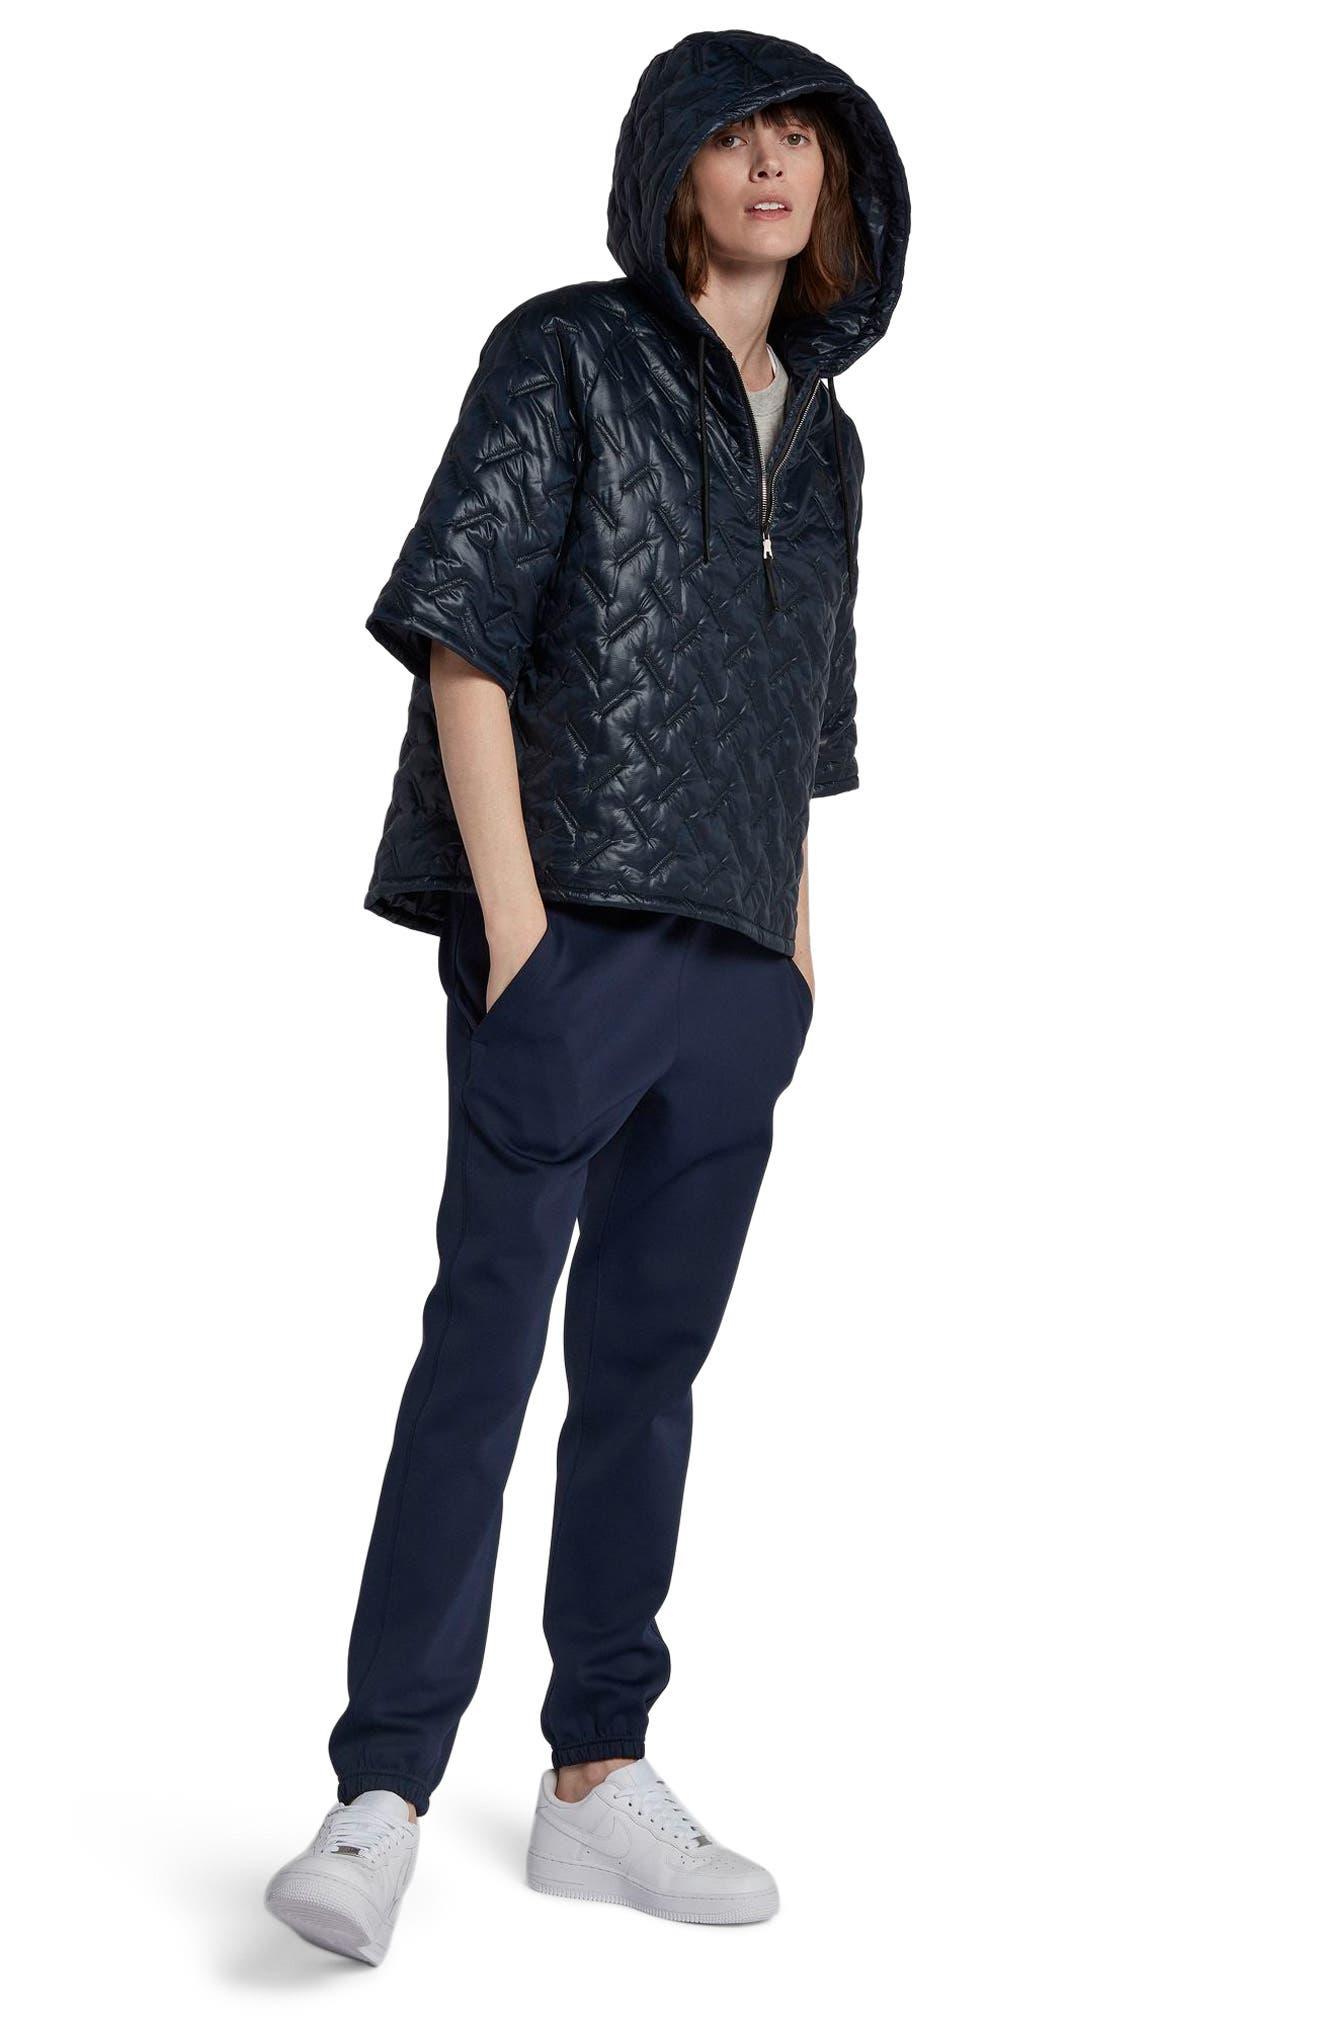 NikeLab Essentials Insulated Short Sleeve Women's Hoodie,                             Alternate thumbnail 11, color,                             Dark Obsidian/ Black